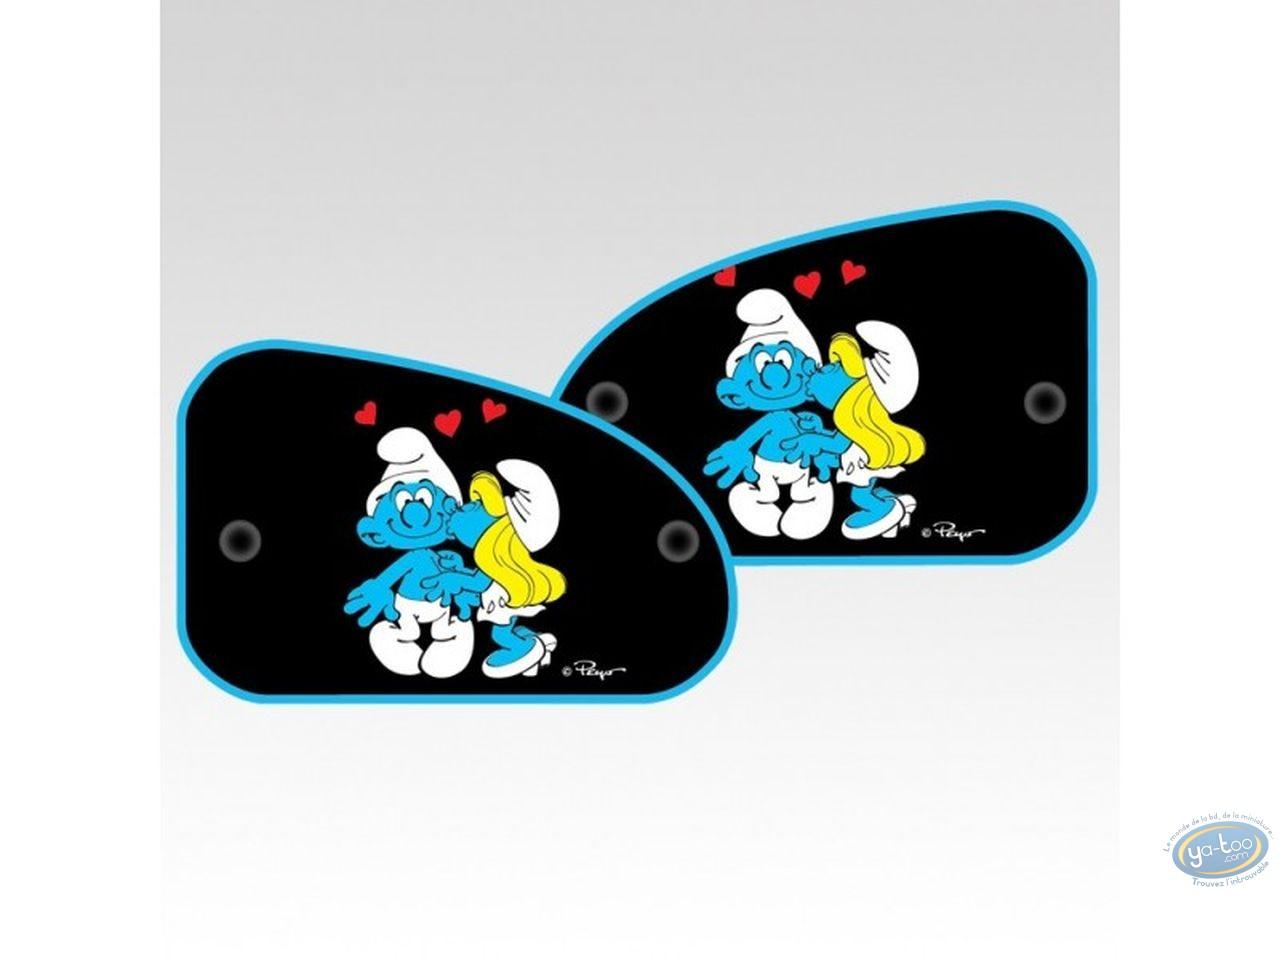 Auto accessory, Smurfs (The) : 2 sides sun visor XL, Smurfette kiss